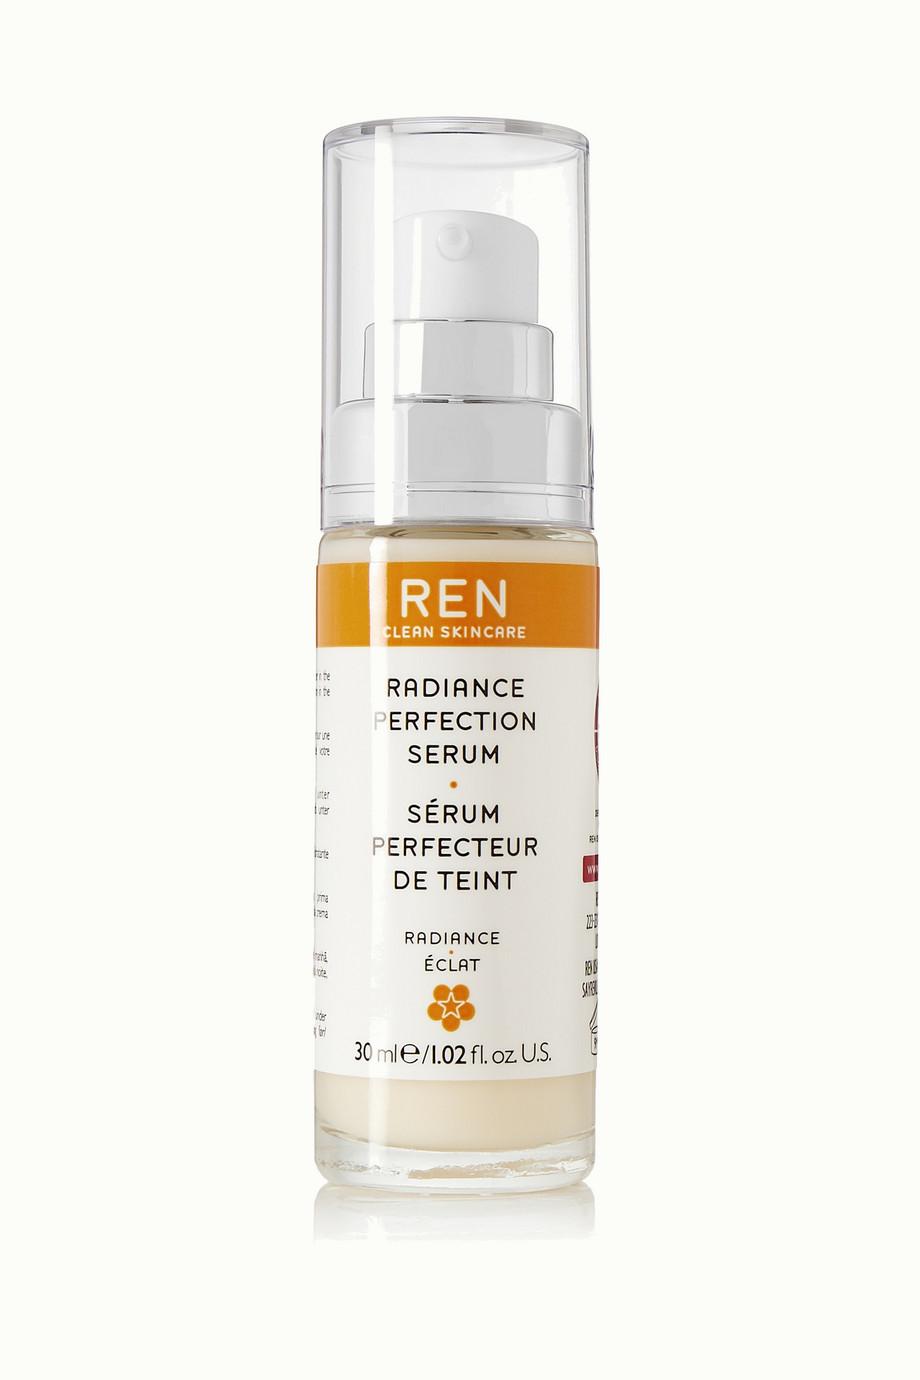 REN Clean Skincare + NET SUSTAIN Radiance Perfection Serum, 30ml